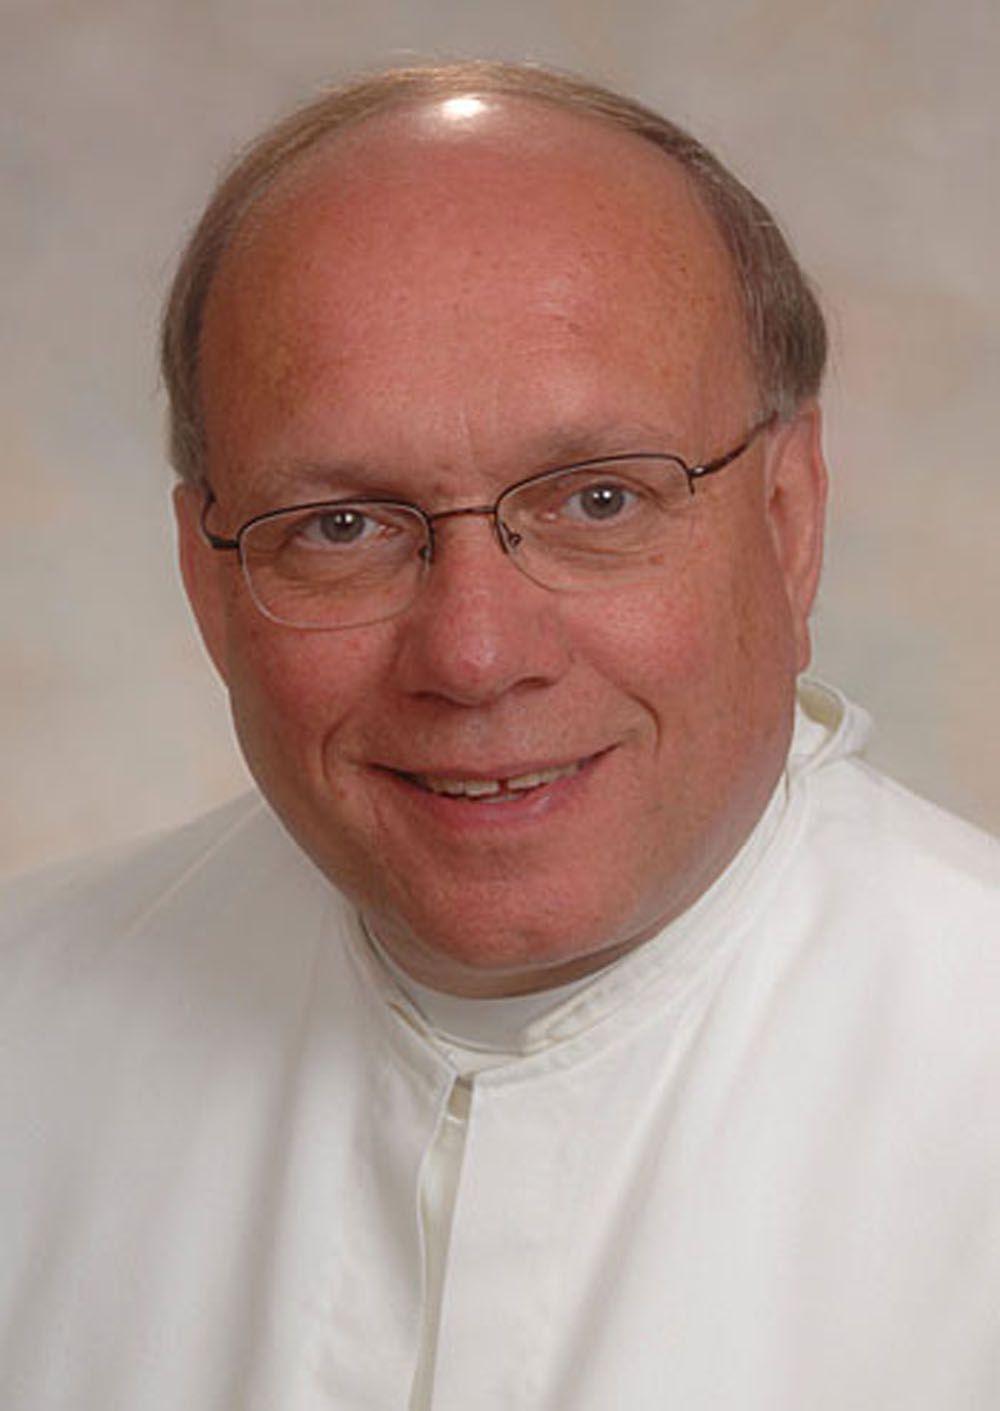 The Rev. Dane Radecki, abbot of the Norbertines Catholic religious order in Wisconsin.